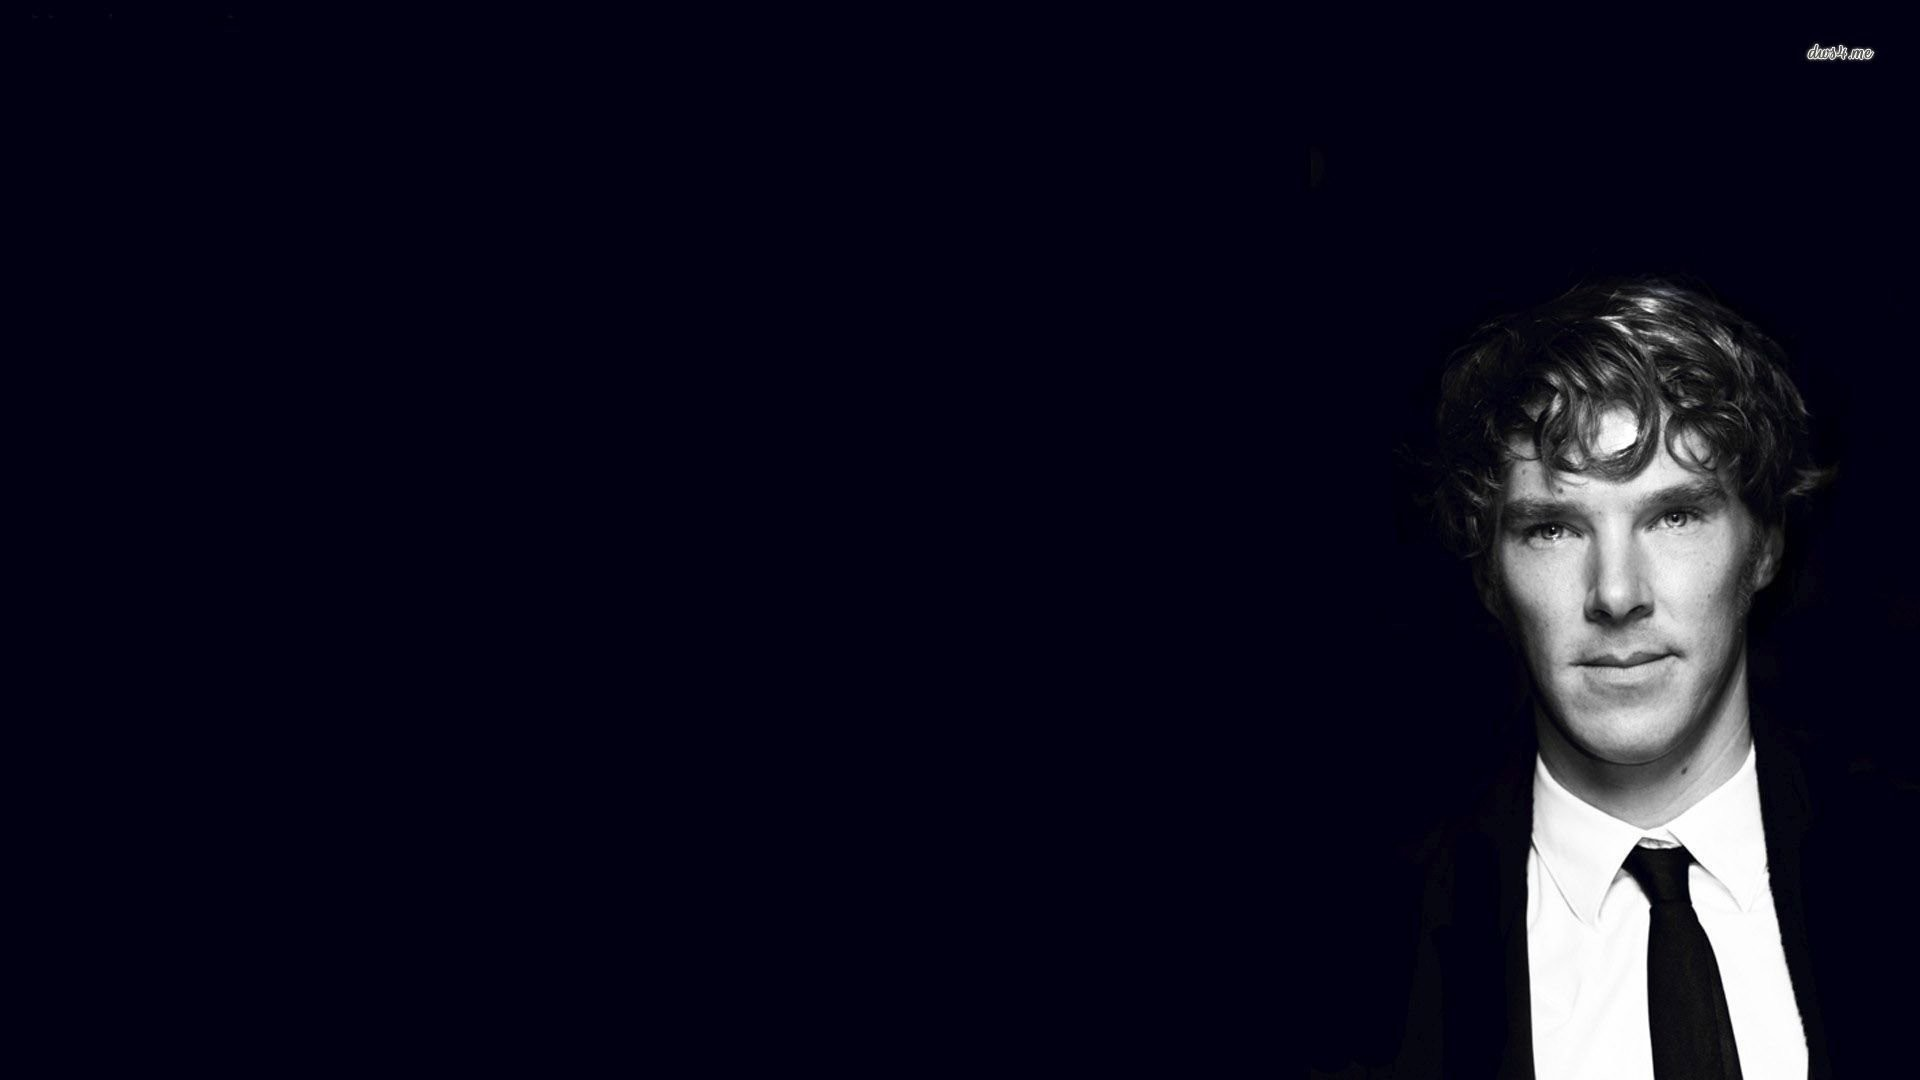 Benedict Cumberbatch Sherlock Wallpaper (82+ Images